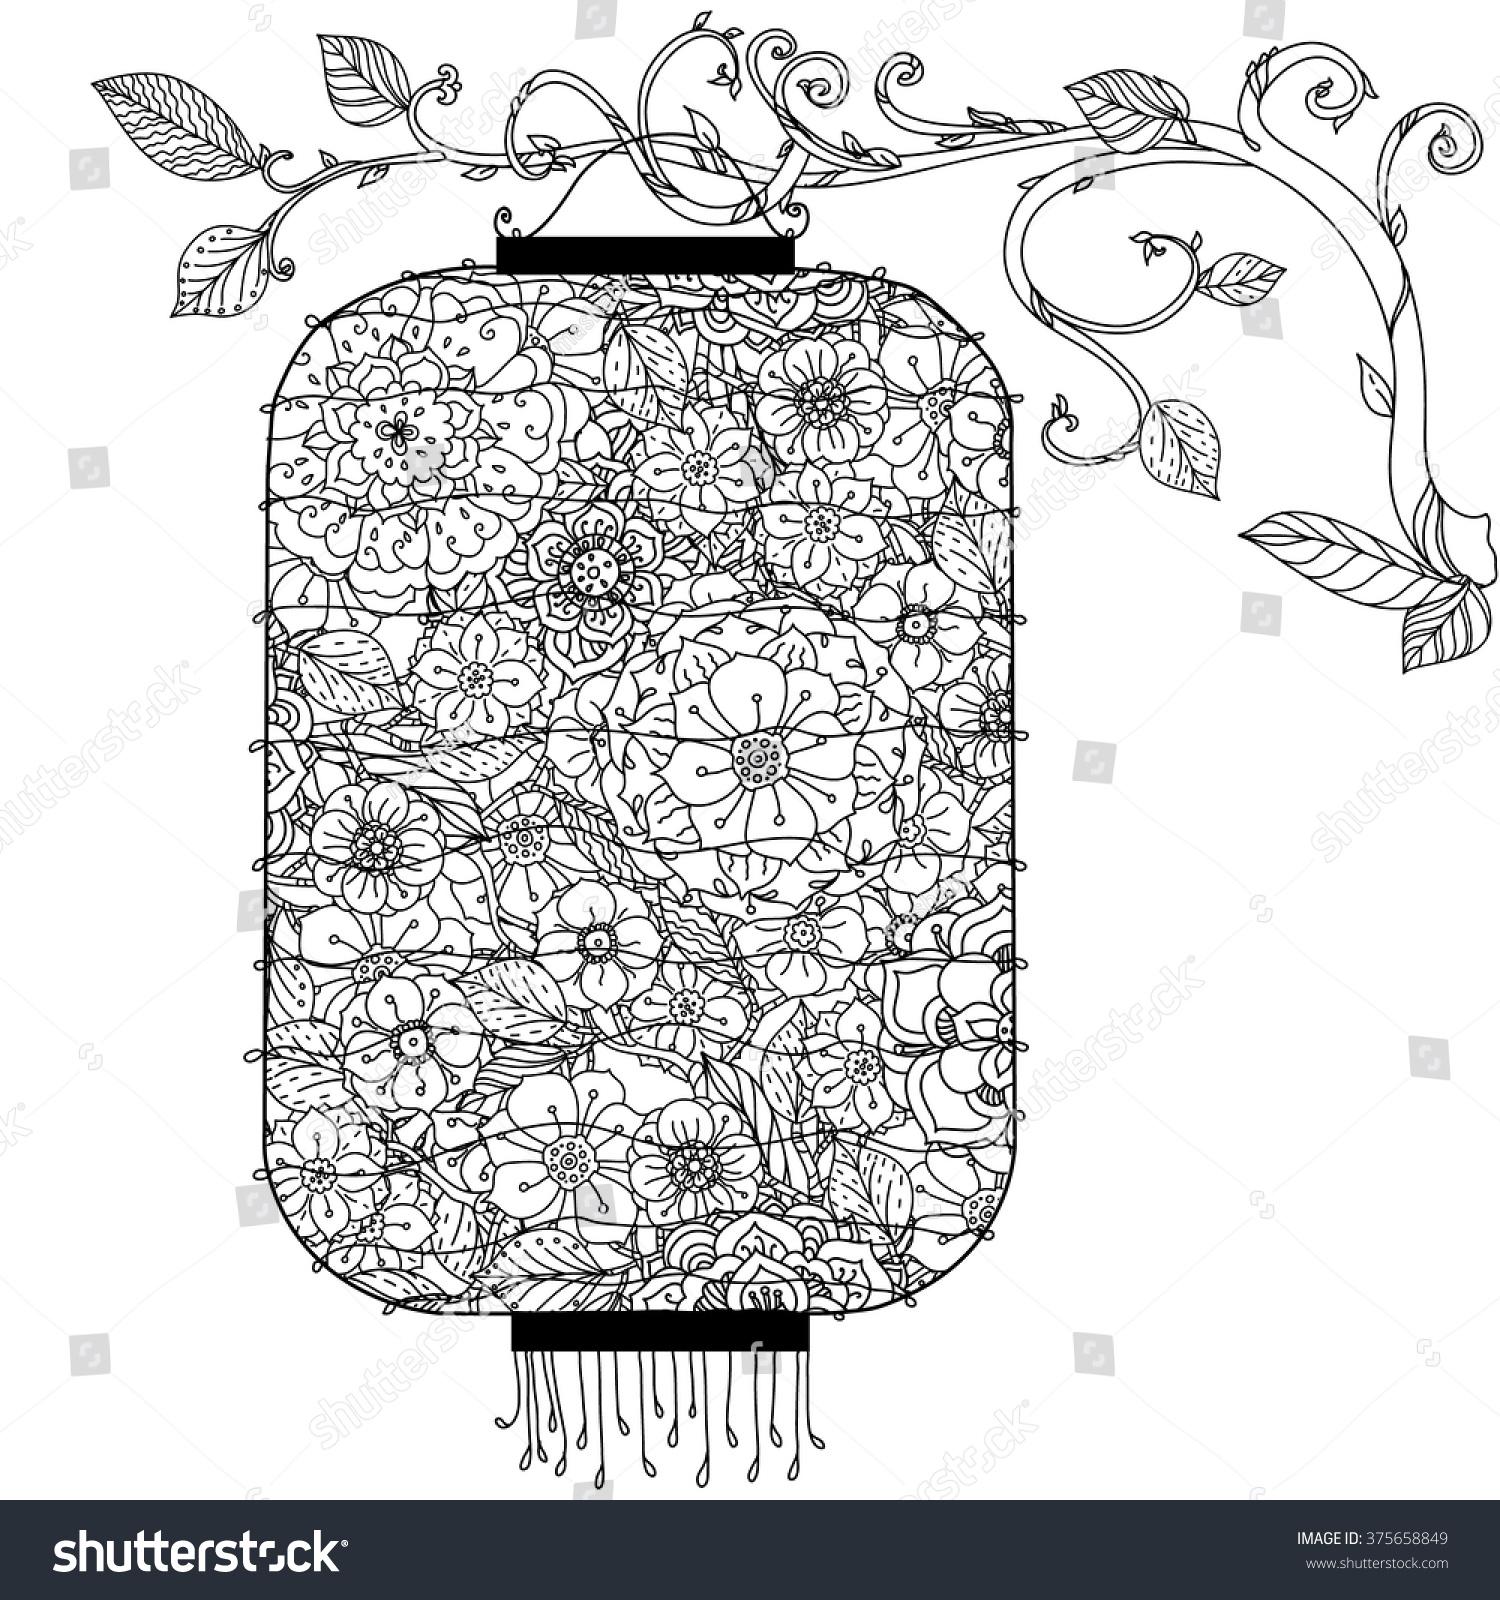 Chinese Lantern Hand Drawing Zentangle Interpretation Black And White Vector Illustration The